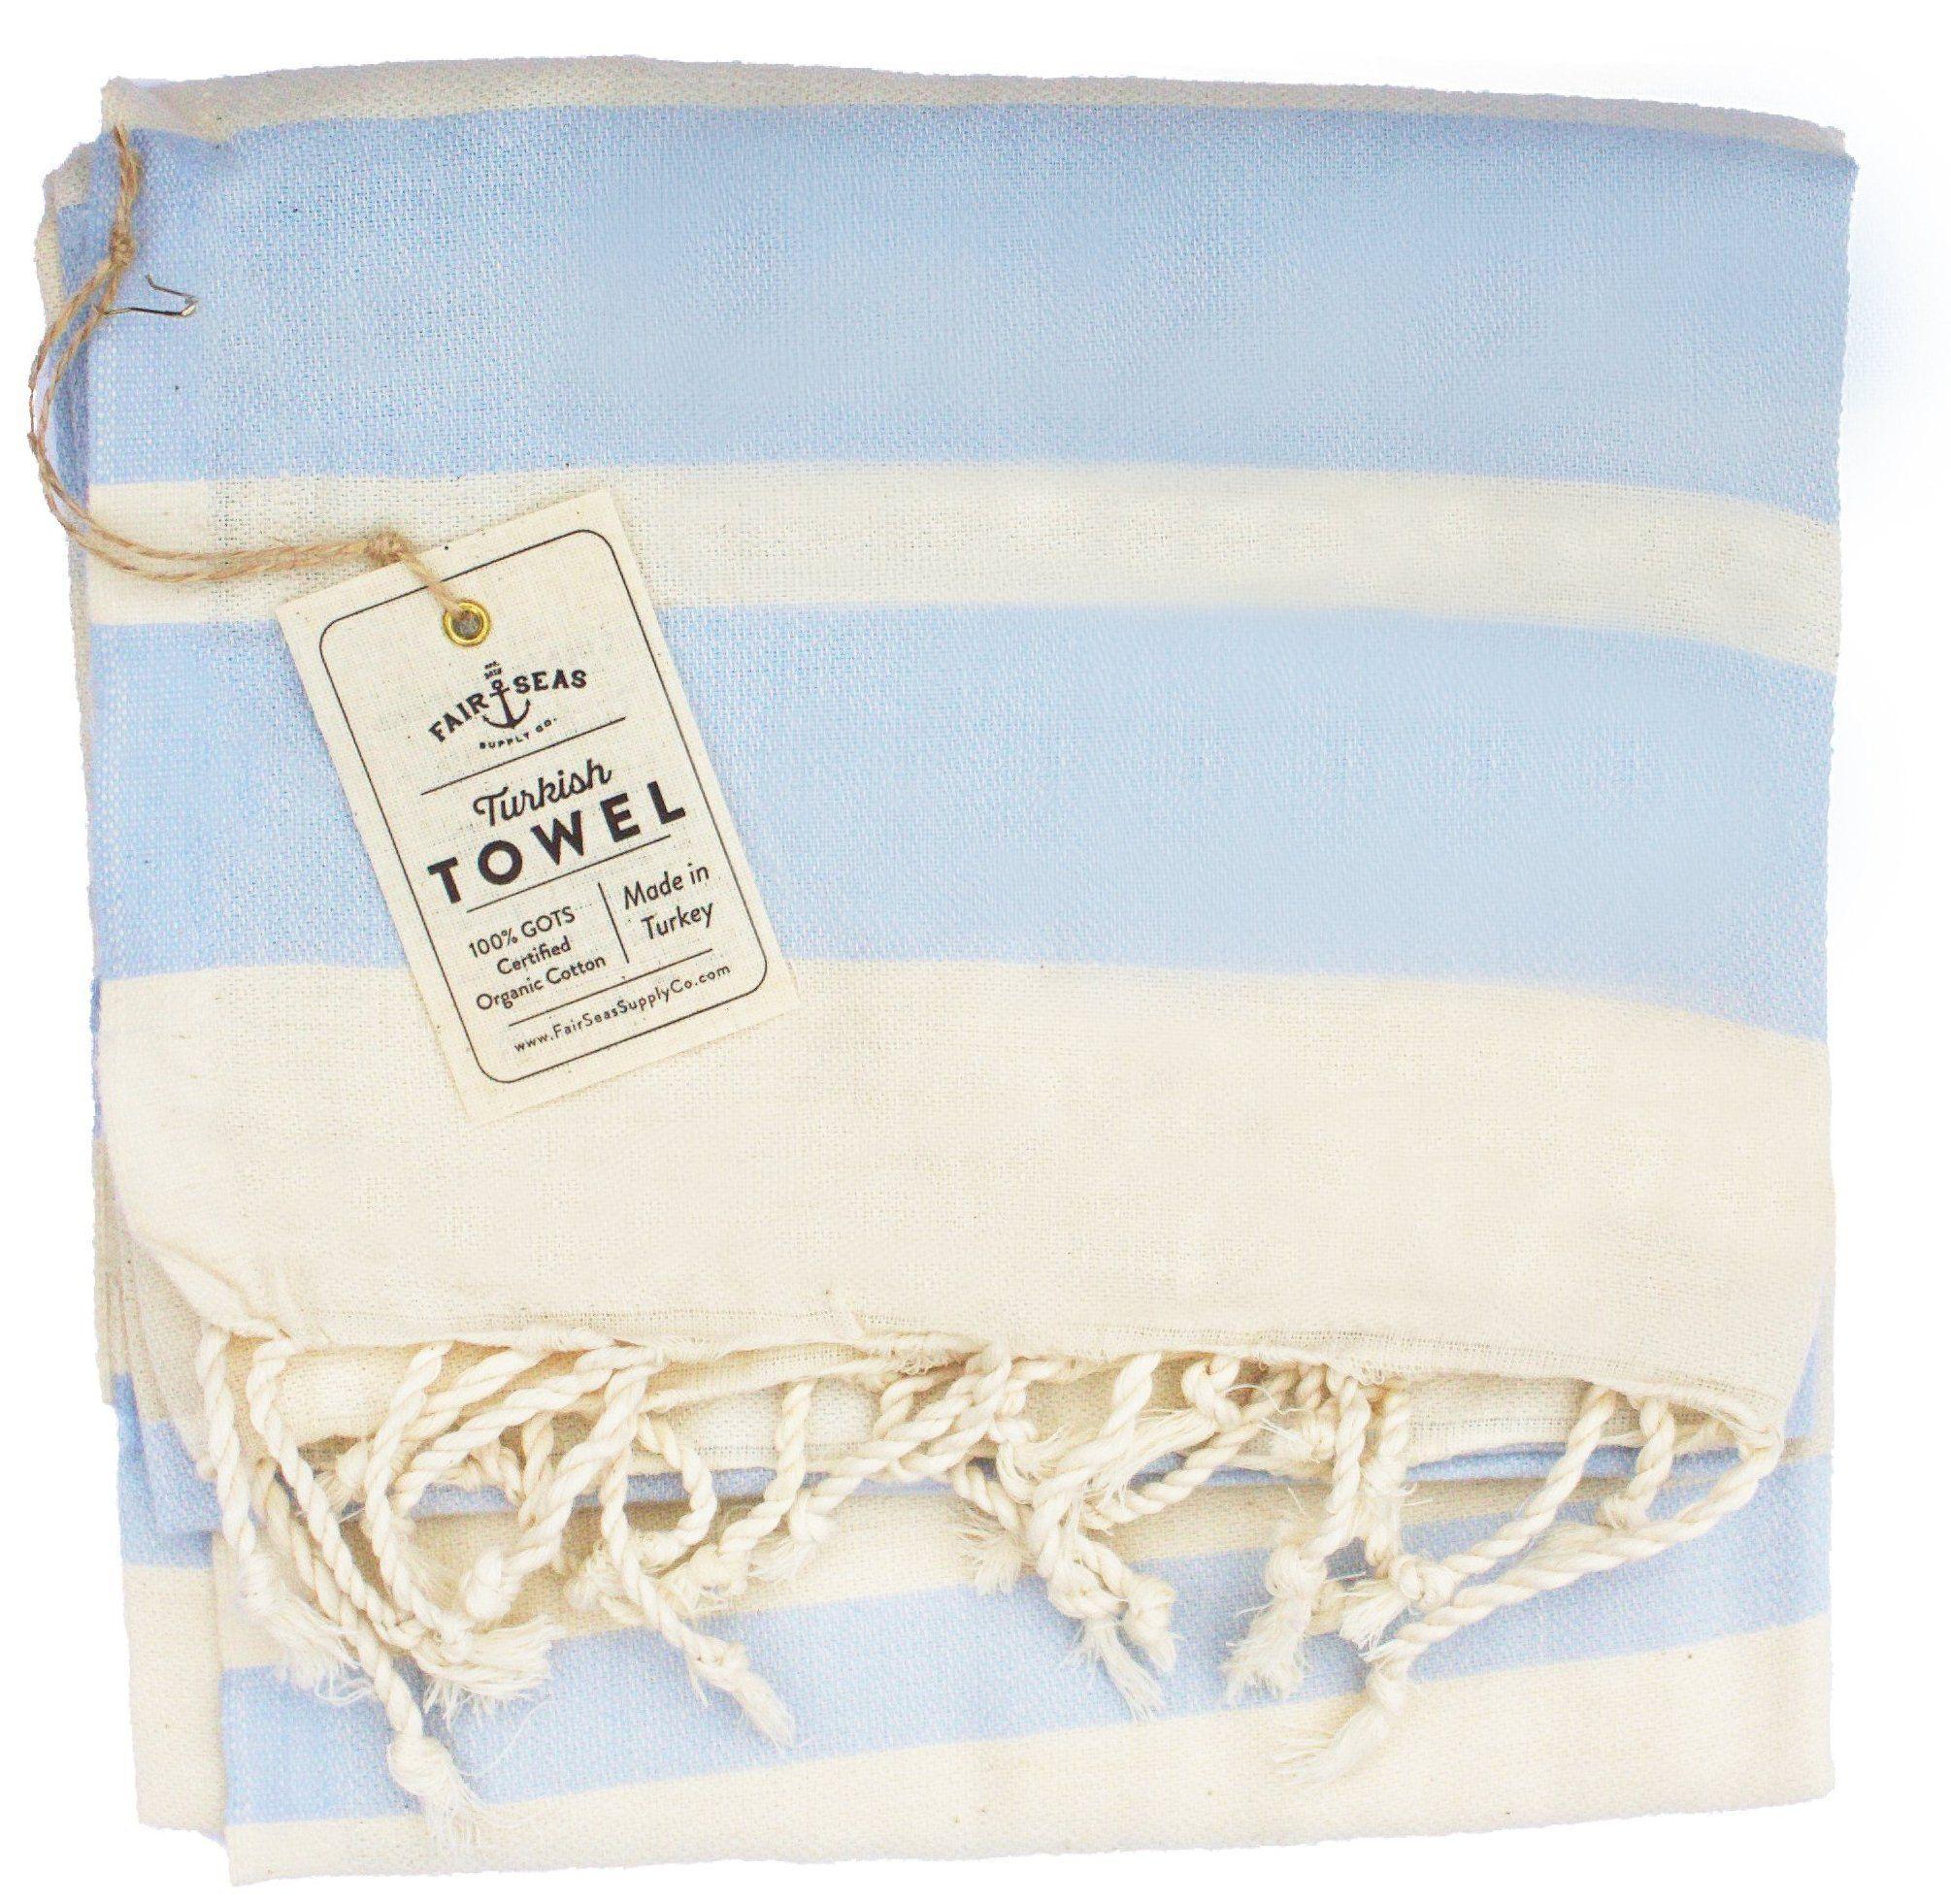 The Charleston Caribbean Blue Haint Blue Turkish Towels Fabric